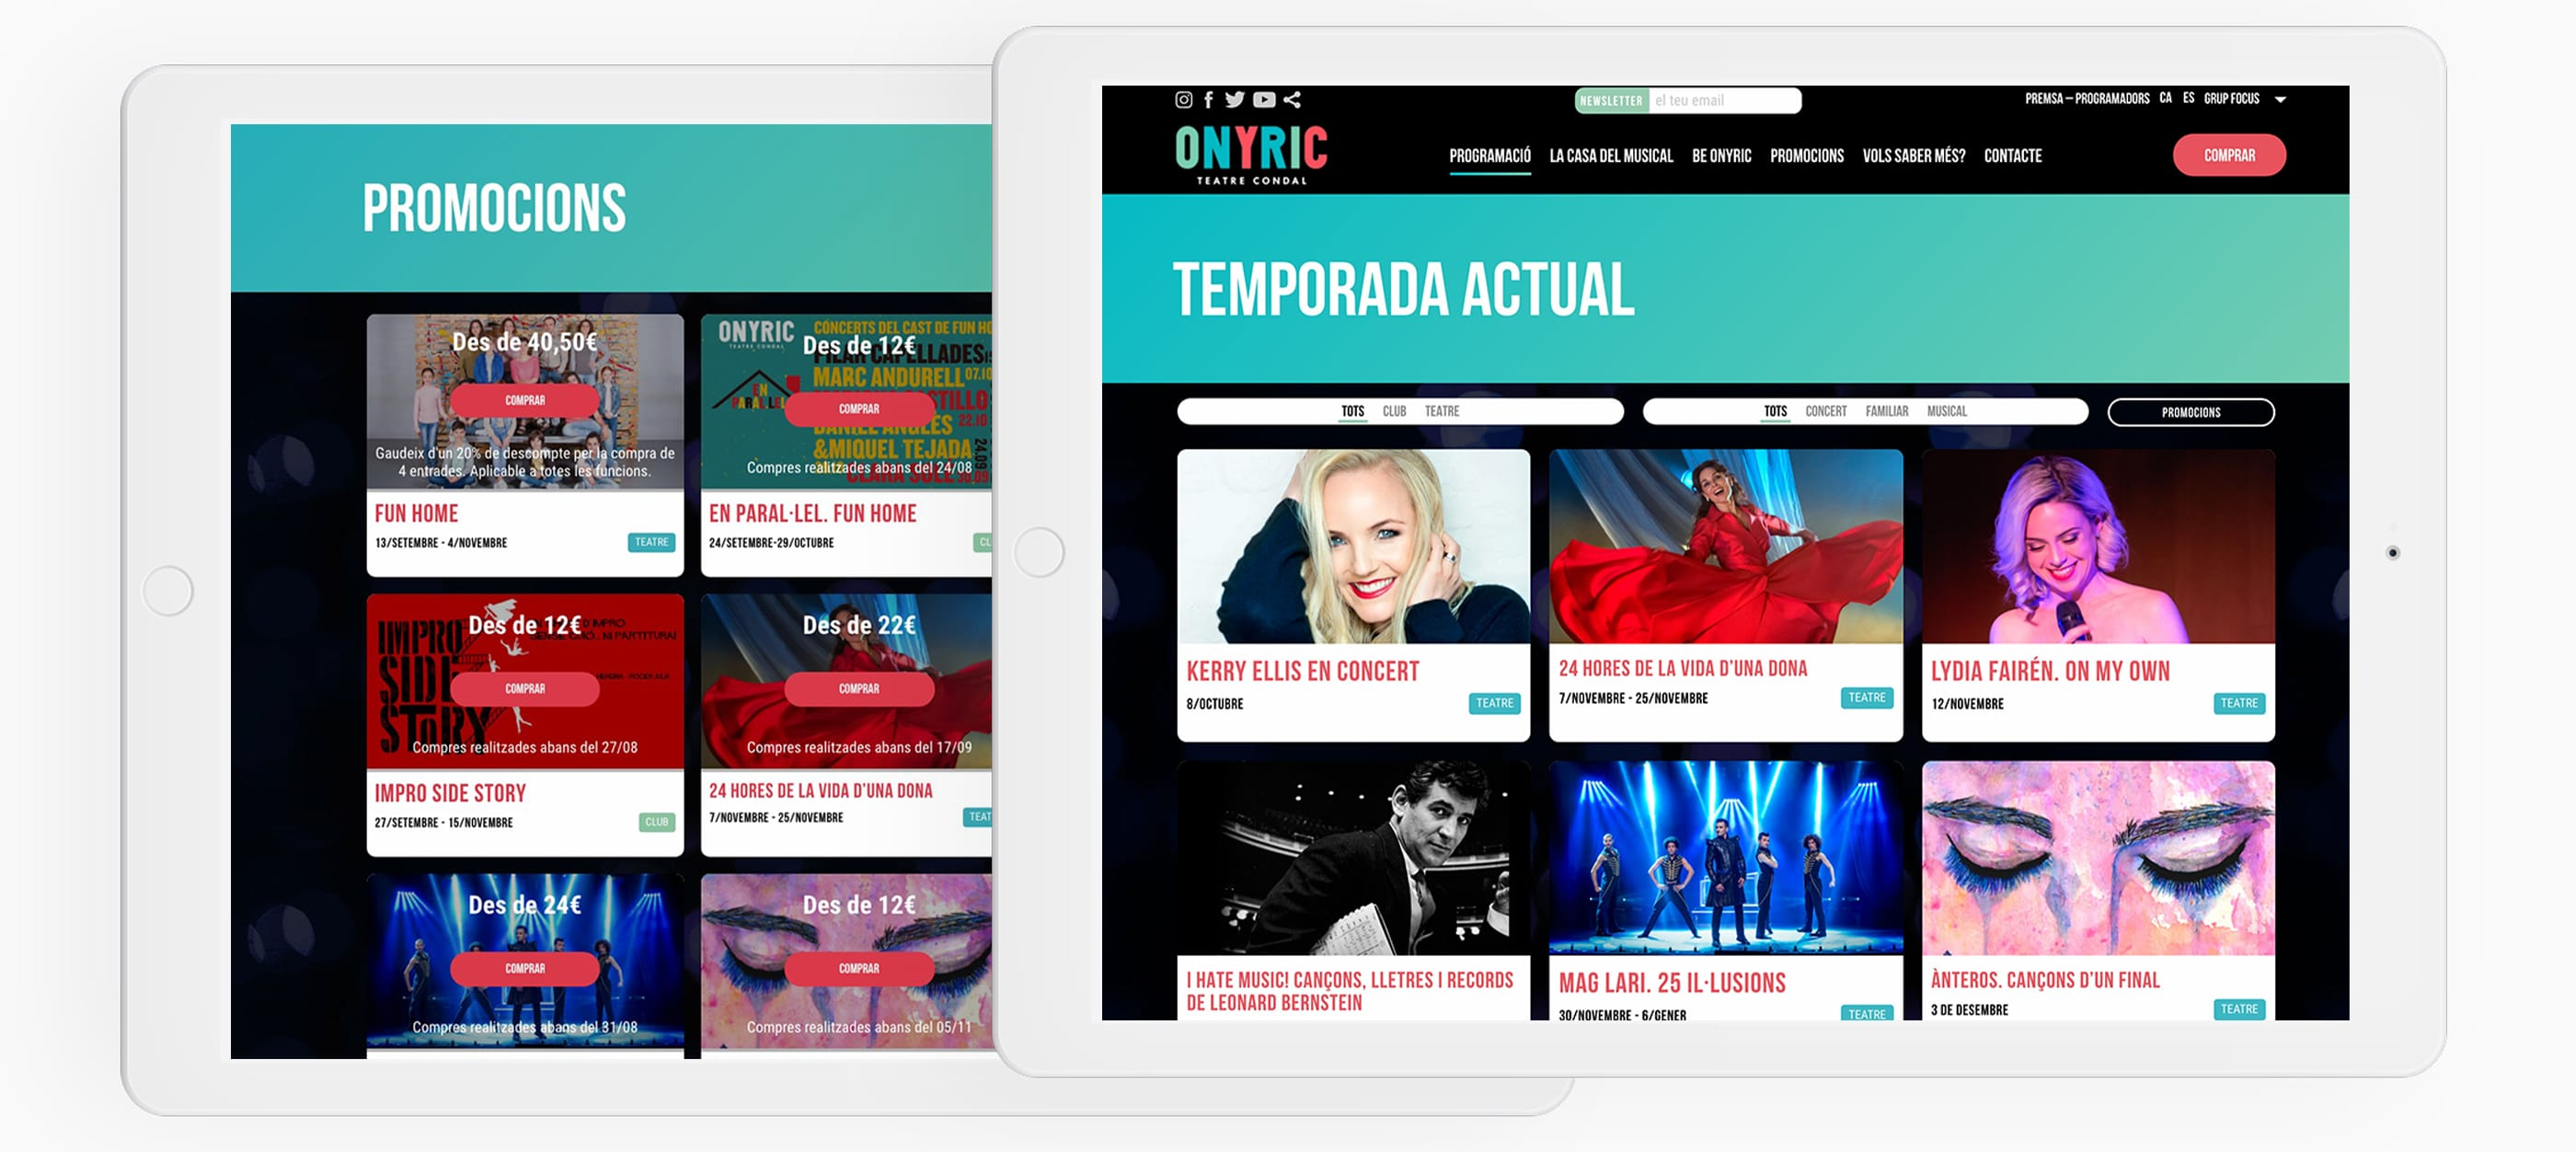 onyric teatre condal barcelona